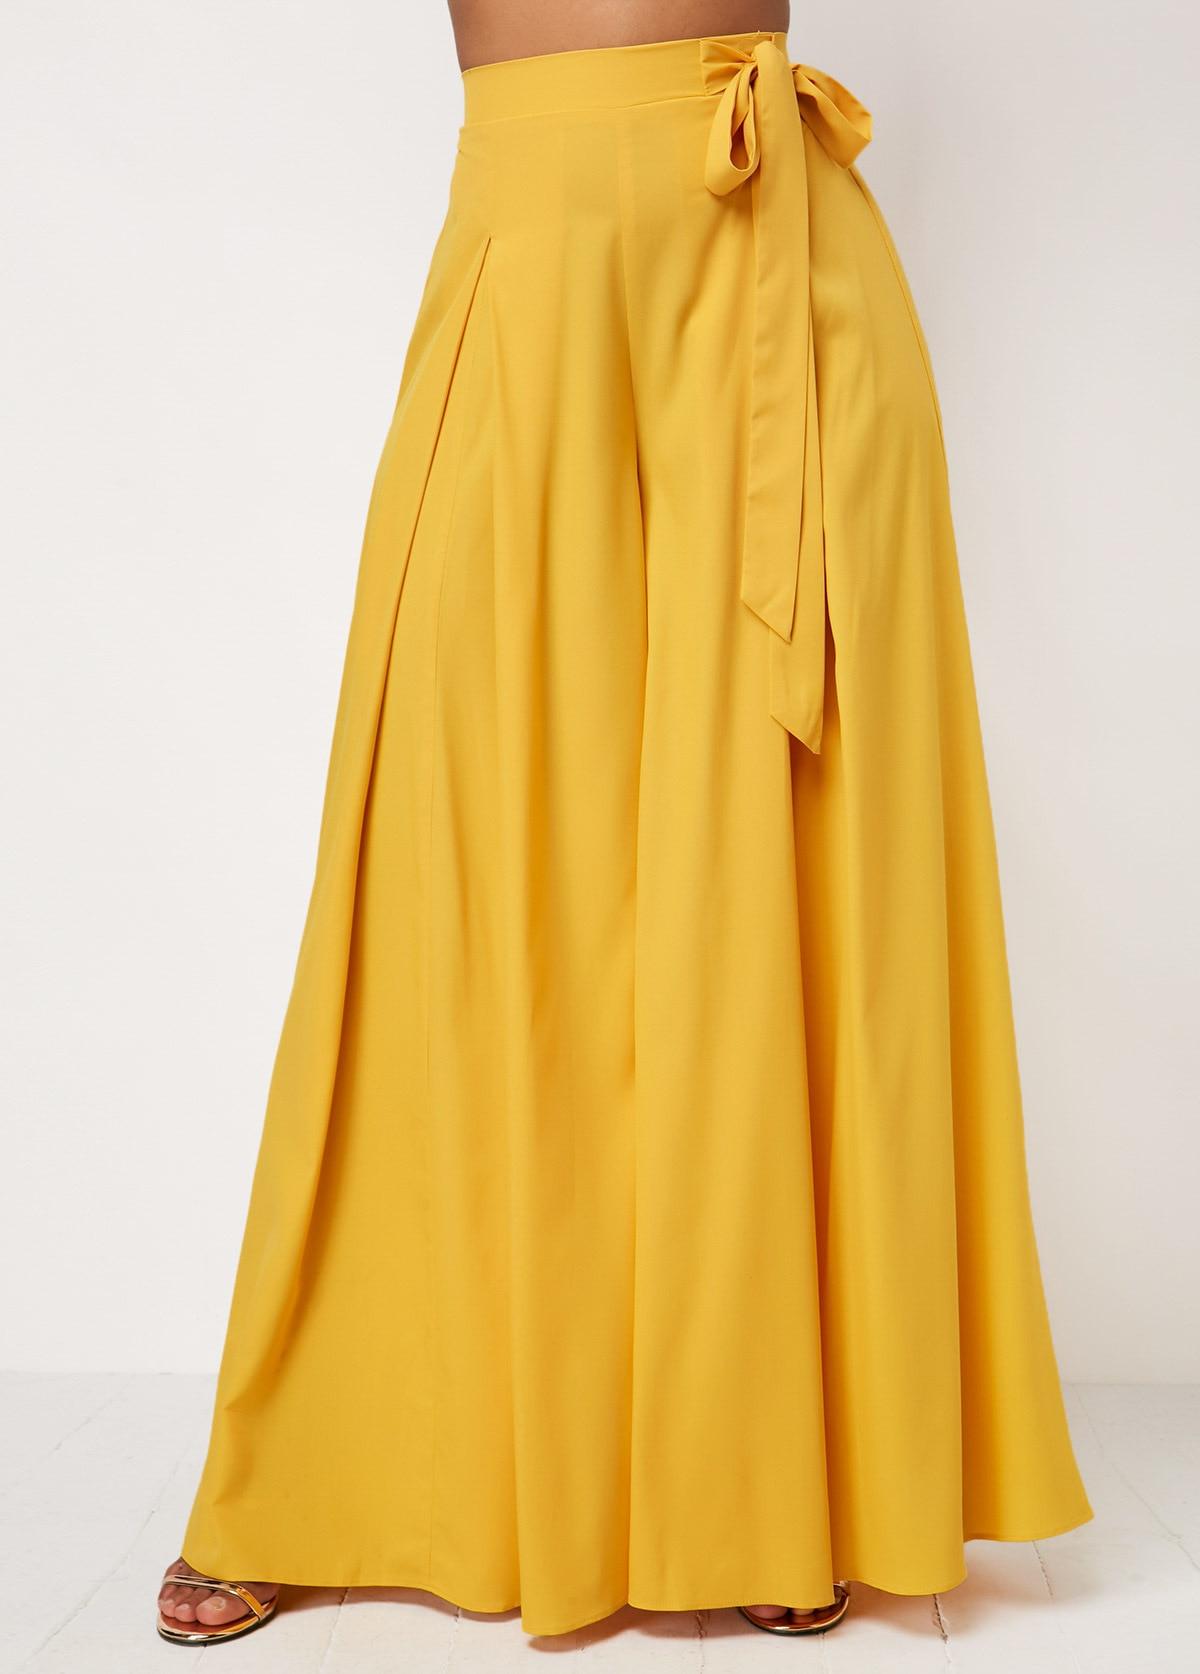 Self Belted Box Pleated Palazzo   Pants   Women Elegant Loose Long   Pants   2018 Fall Yellow High Waist   Wide     Leg     Pants